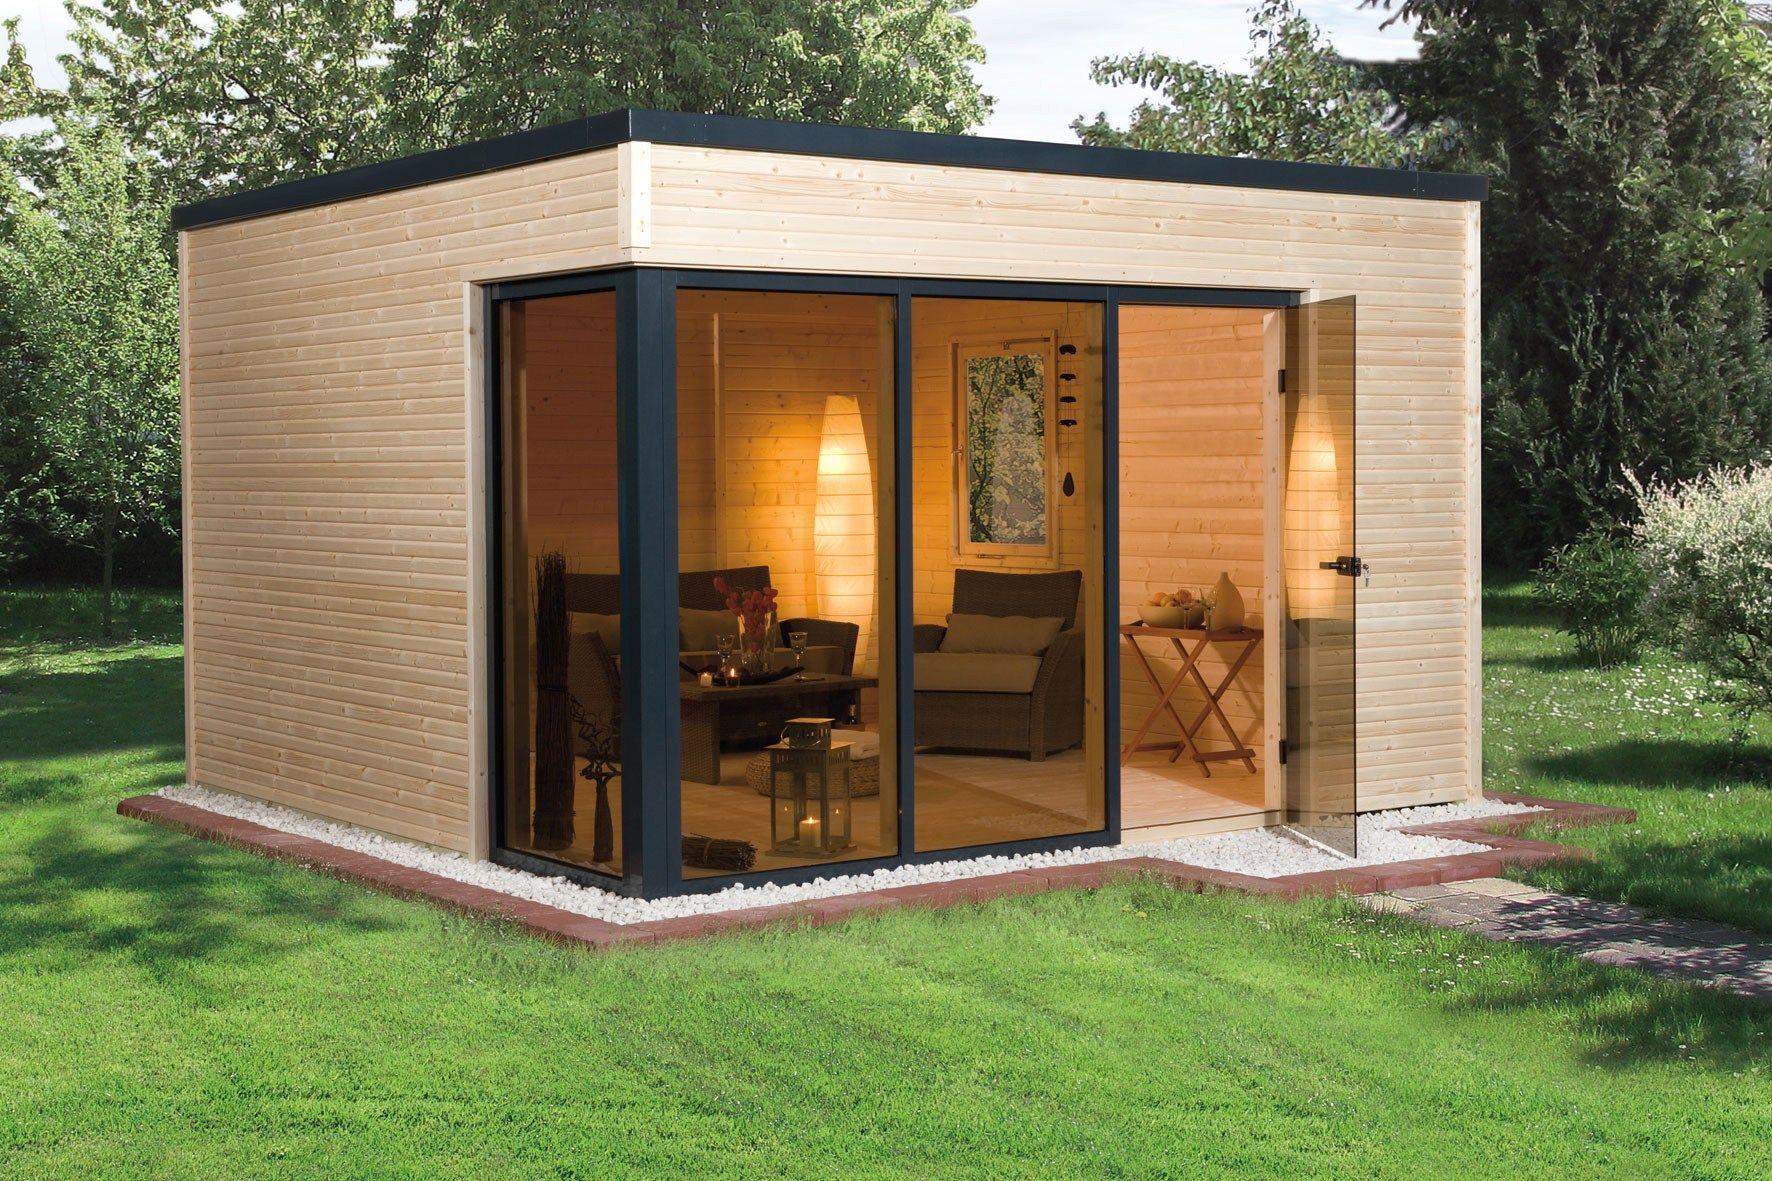 Gartenhaus Aus Ytong in 2020 Design gartenhaus